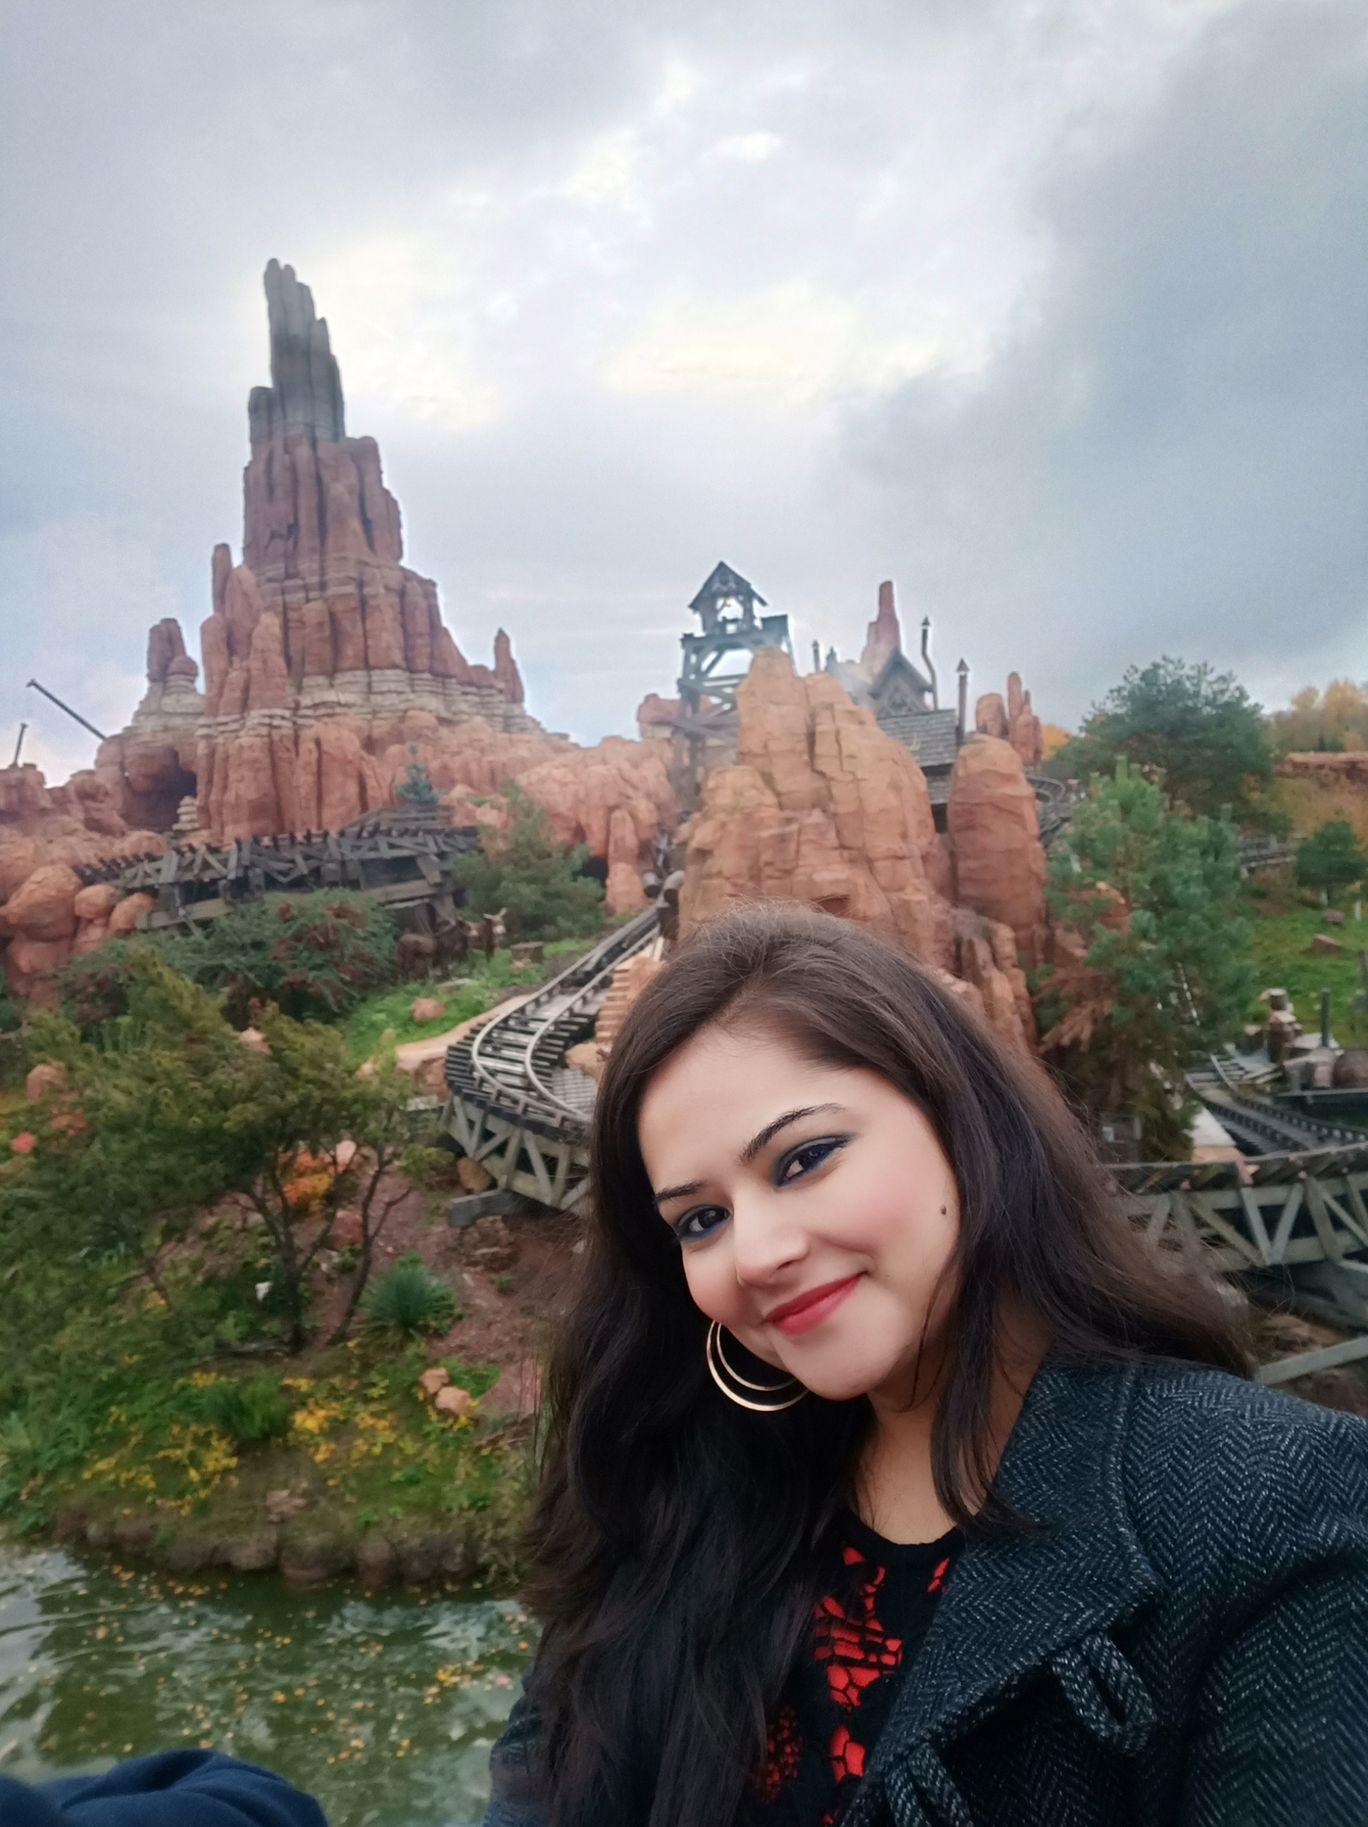 Photo of Disneyland Paris By Vforvidhii